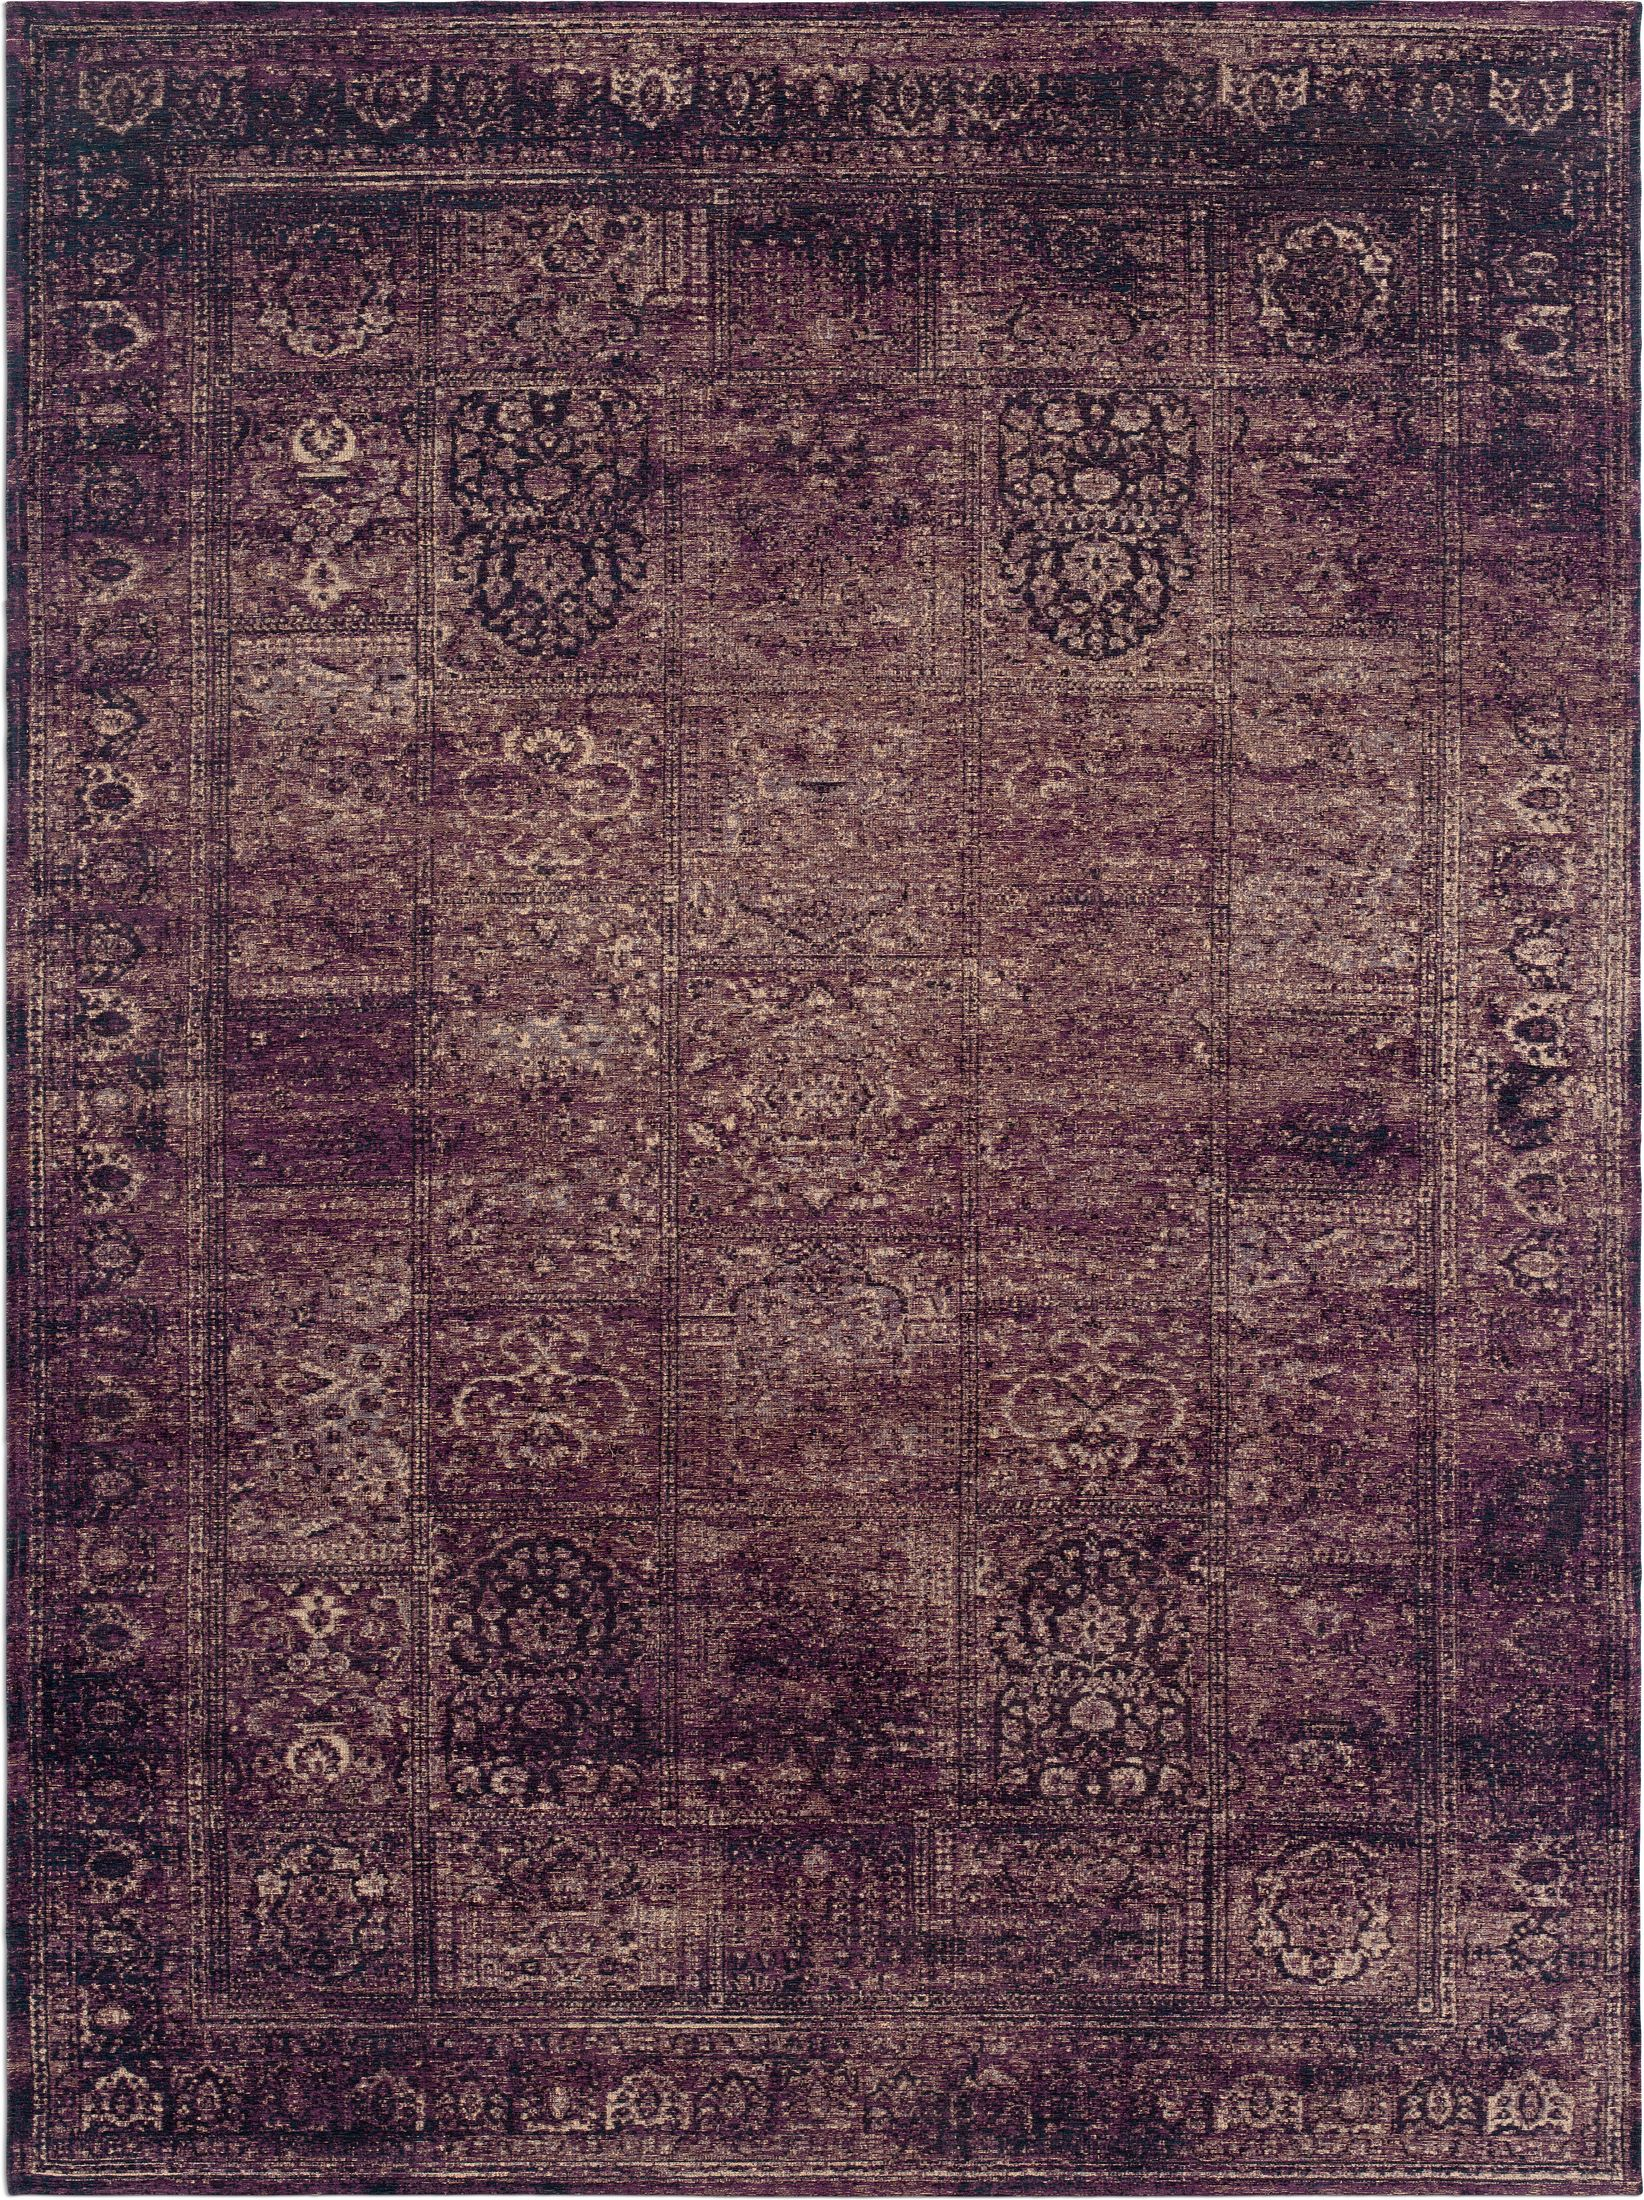 Rugs - Flat Woven Area Rug - Purple